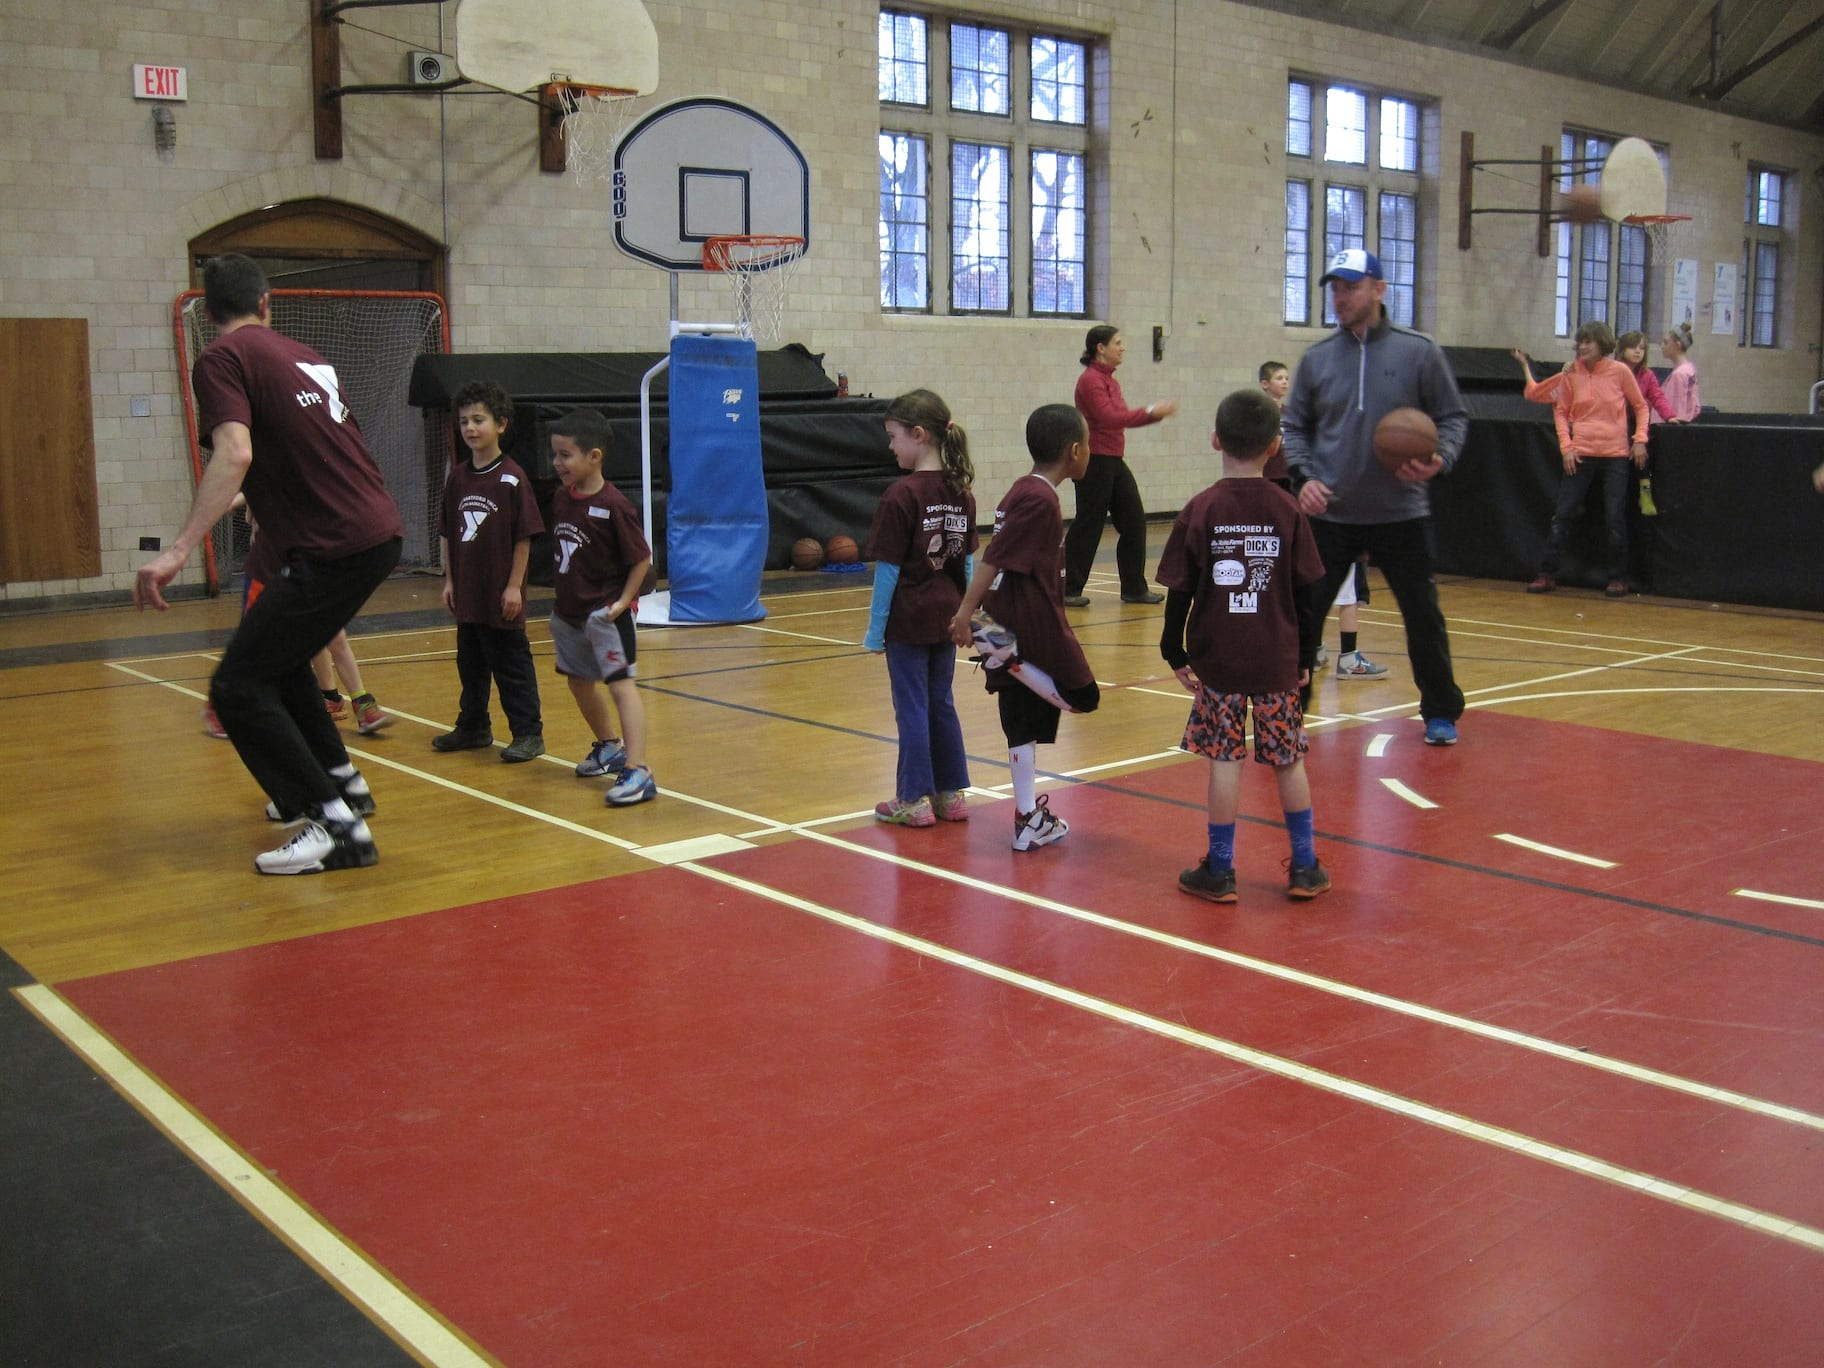 west hartford ymca youth basketball participants enjoy winter